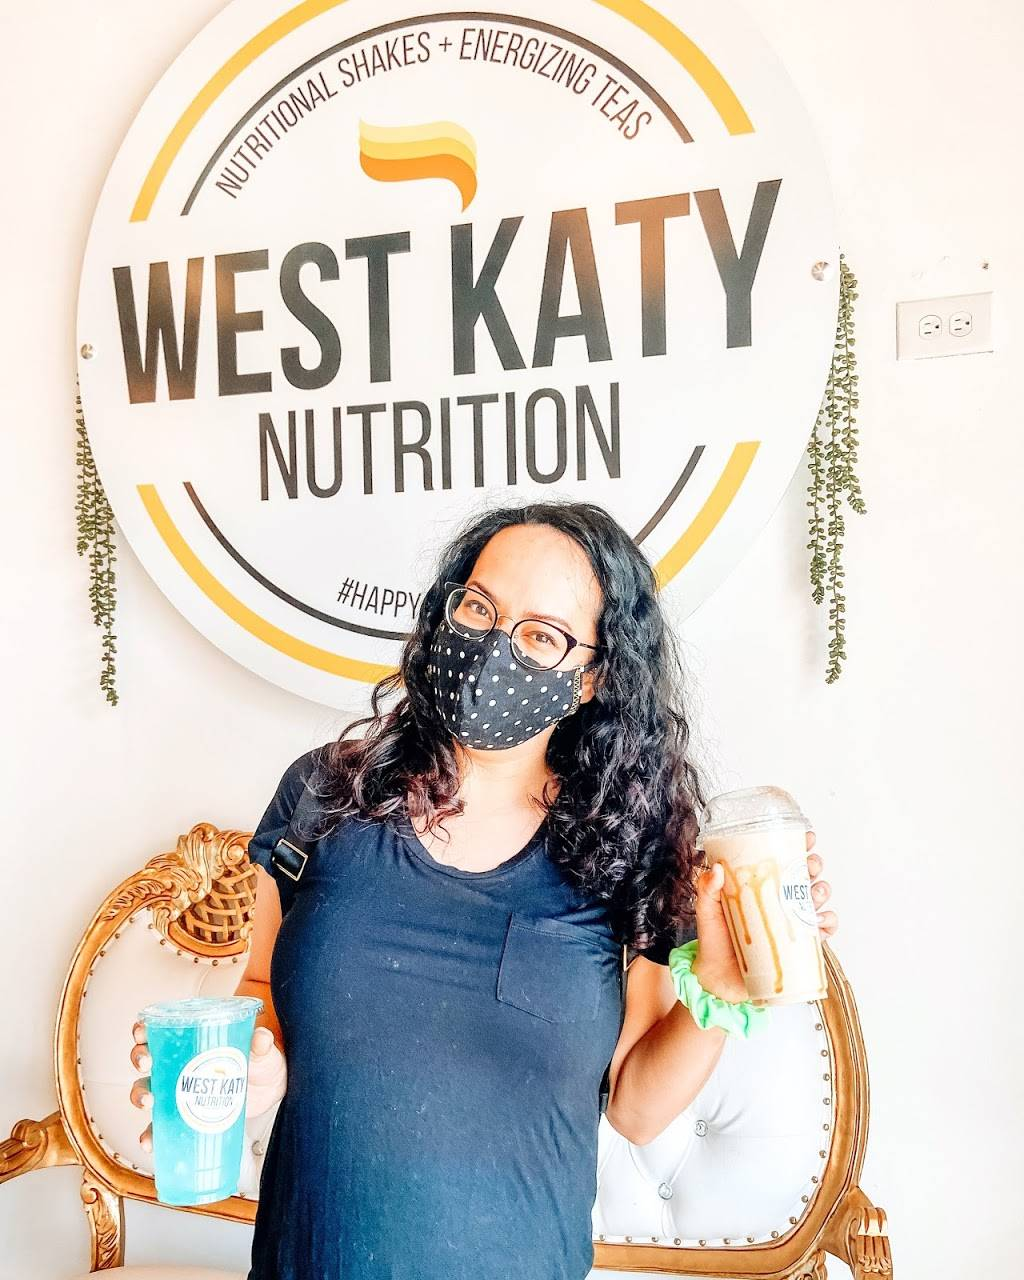 West Katy Nutrition | restaurant | 1251 Pin Oak Rd #125, Katy, TX 77494, USA | 8324375929 OR +1 832-437-5929